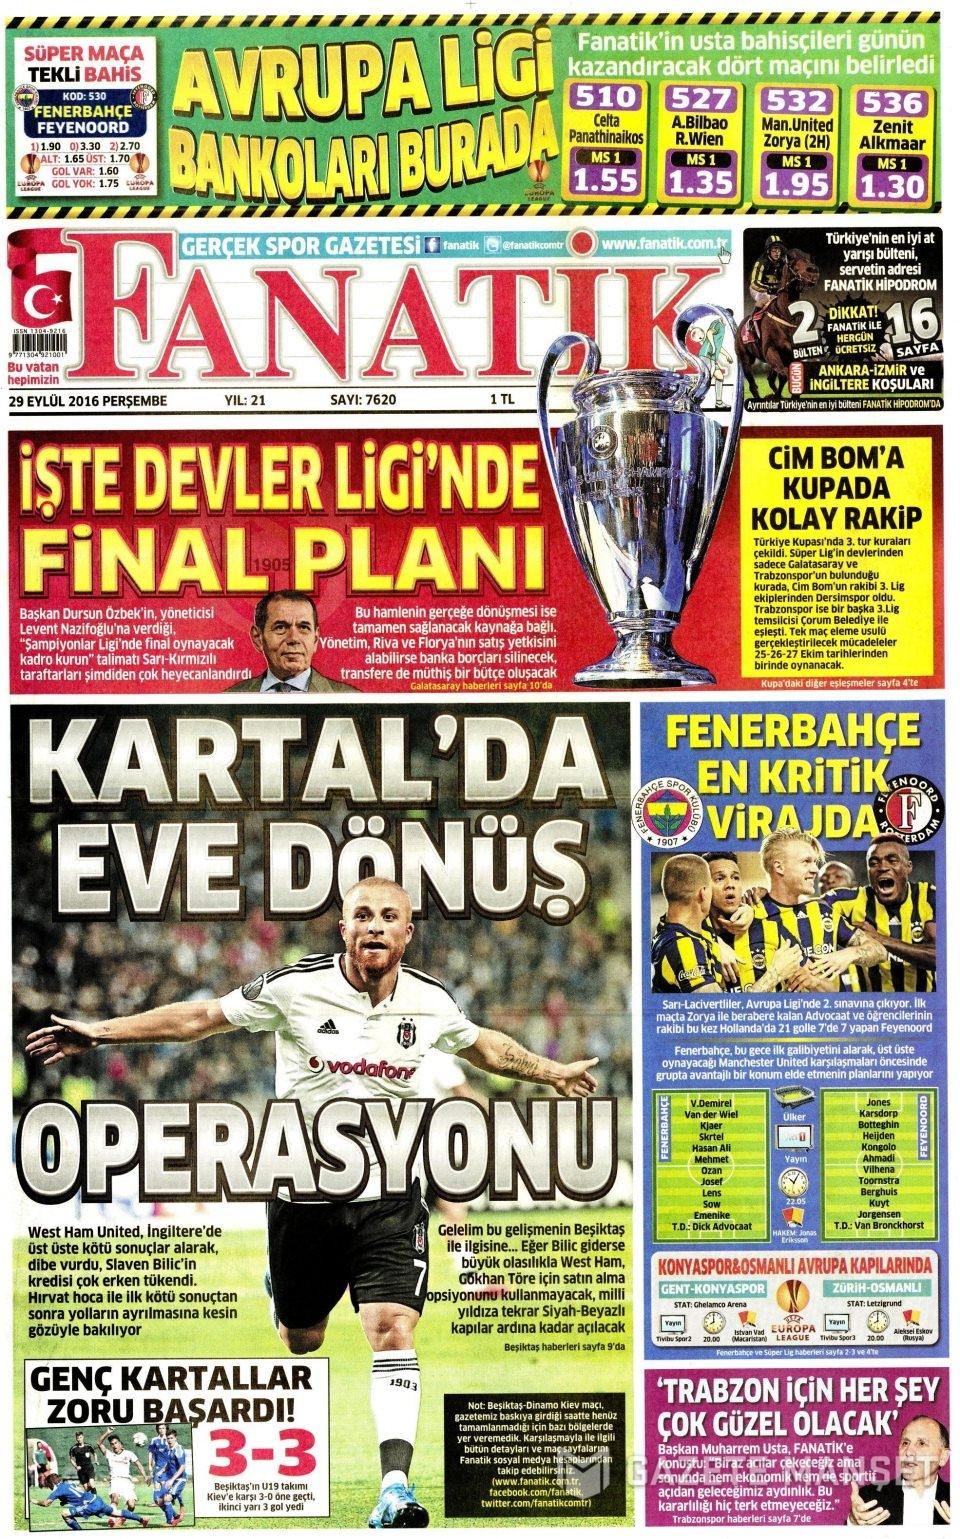 29 Eylül Perşembe gazete manşetleri 14